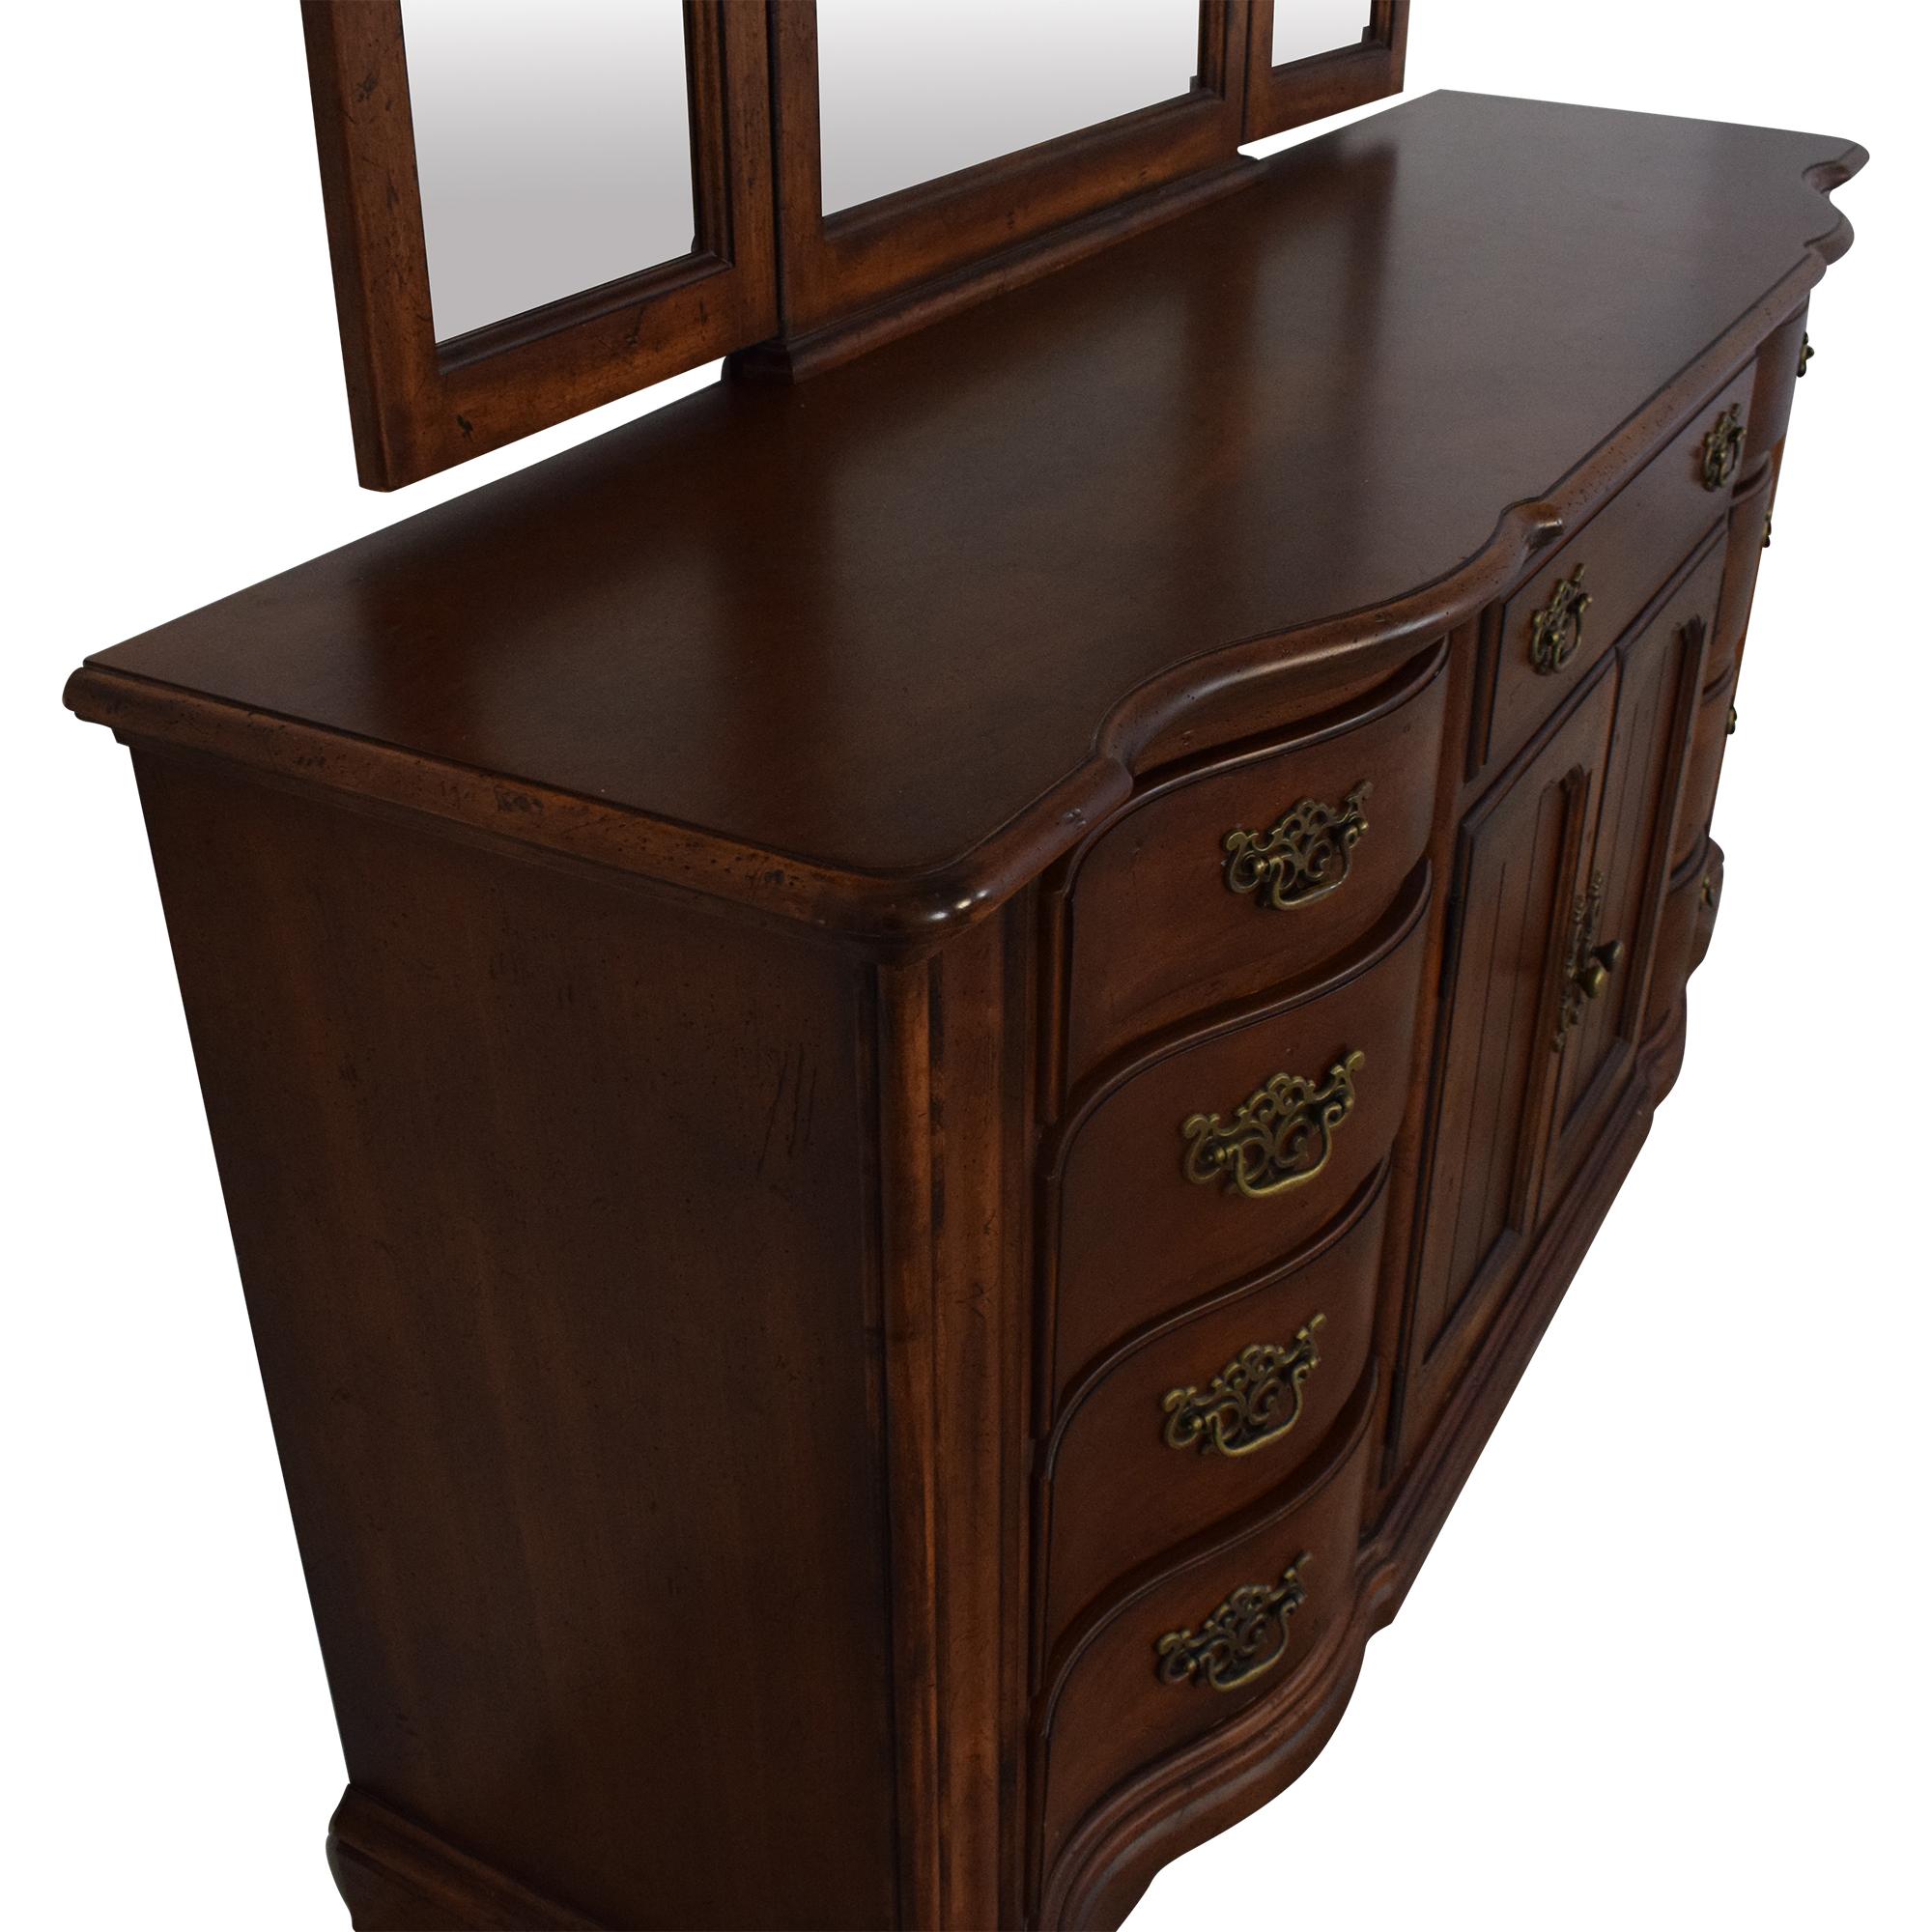 Universal Furniture Universal Furniture Dresser with Mirror on sale